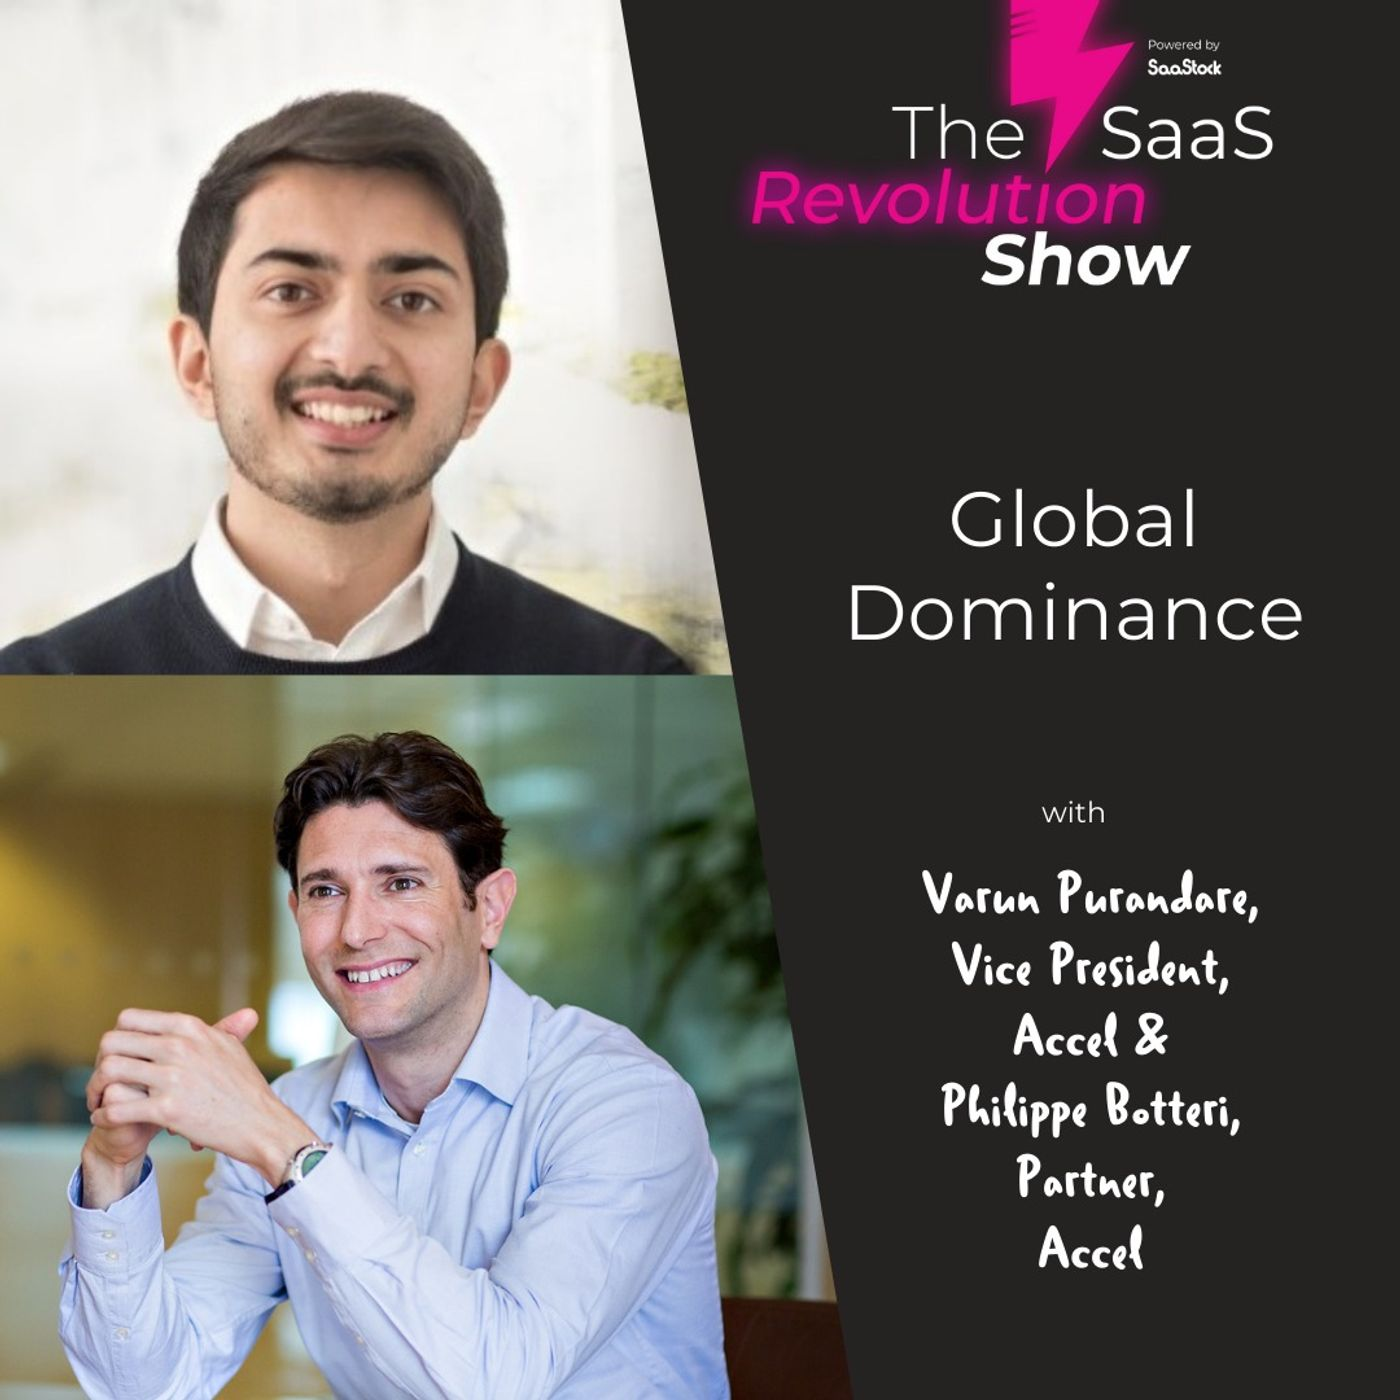 Global Dominance with Philippe Botteri & Varun Purandare (Accel)